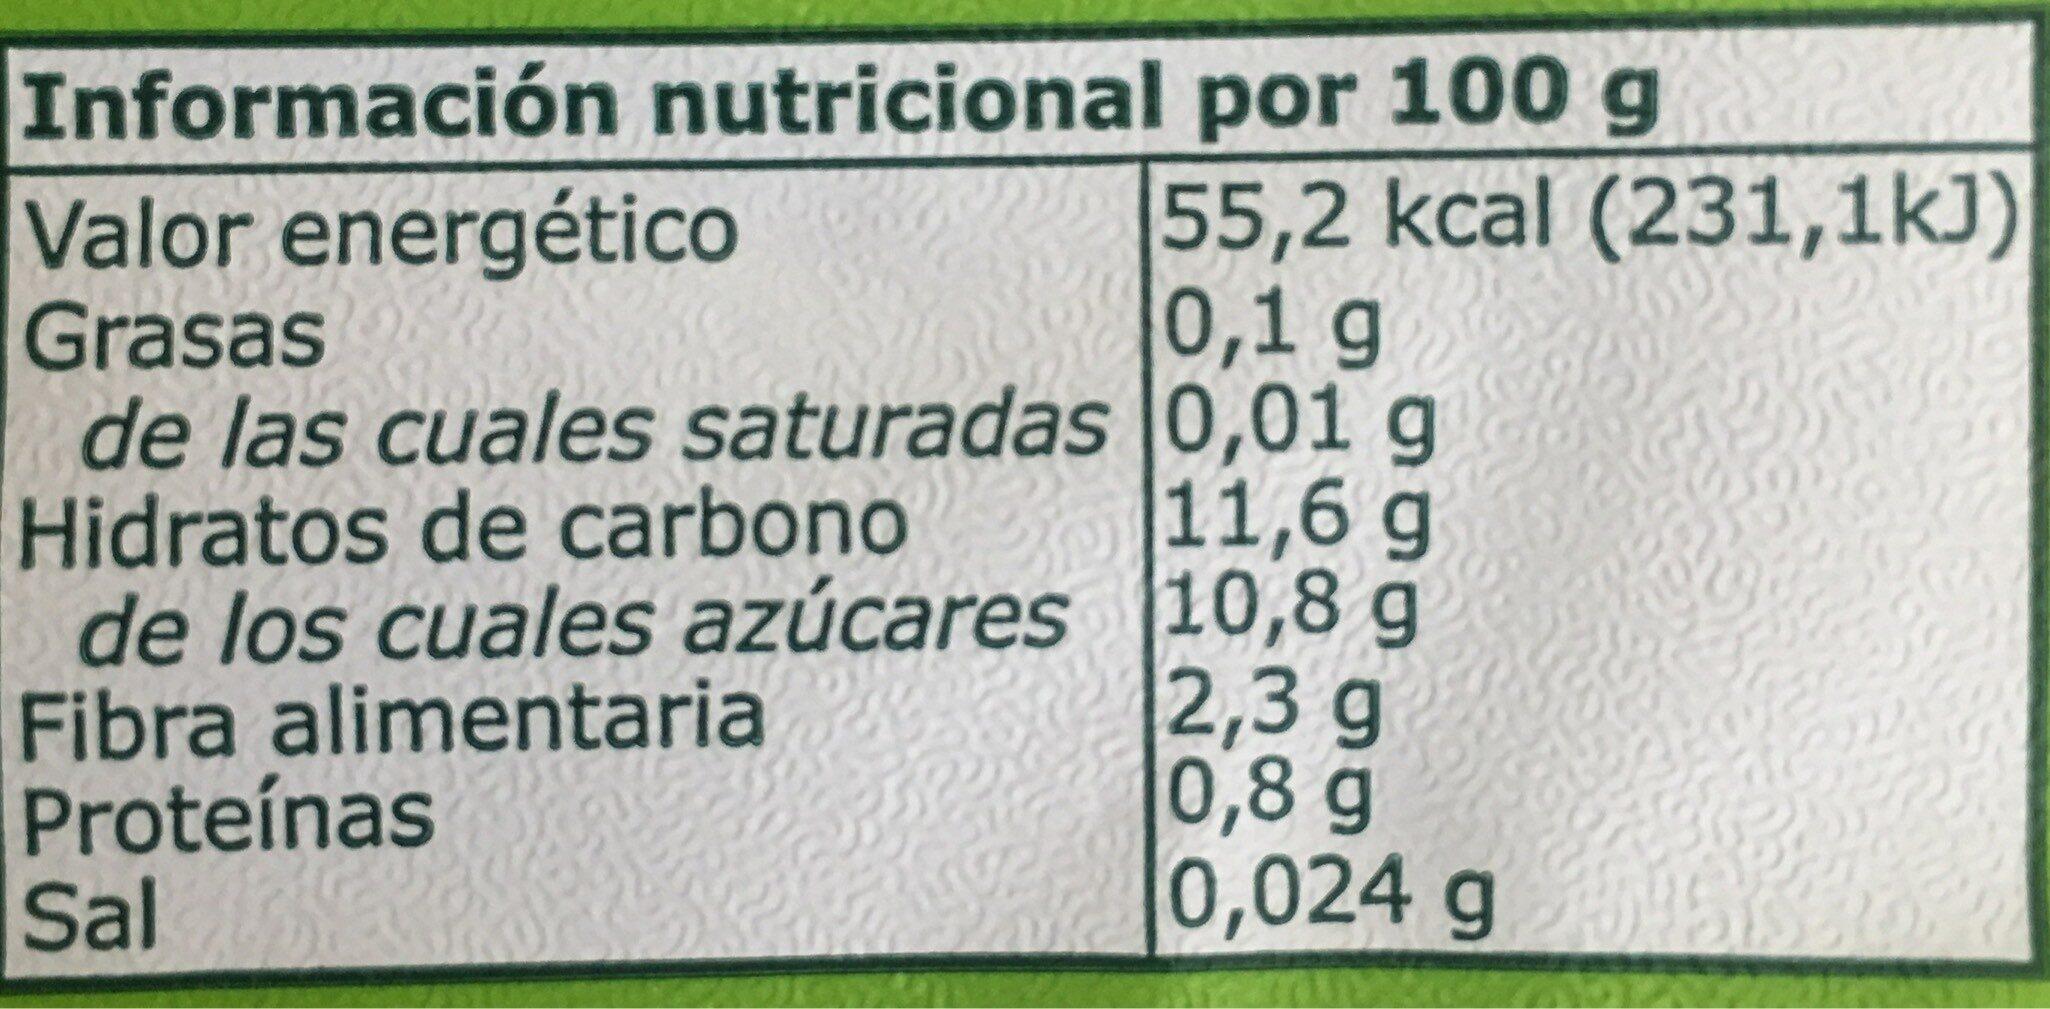 Puré de frutas 100% fruta - Informació nutricional